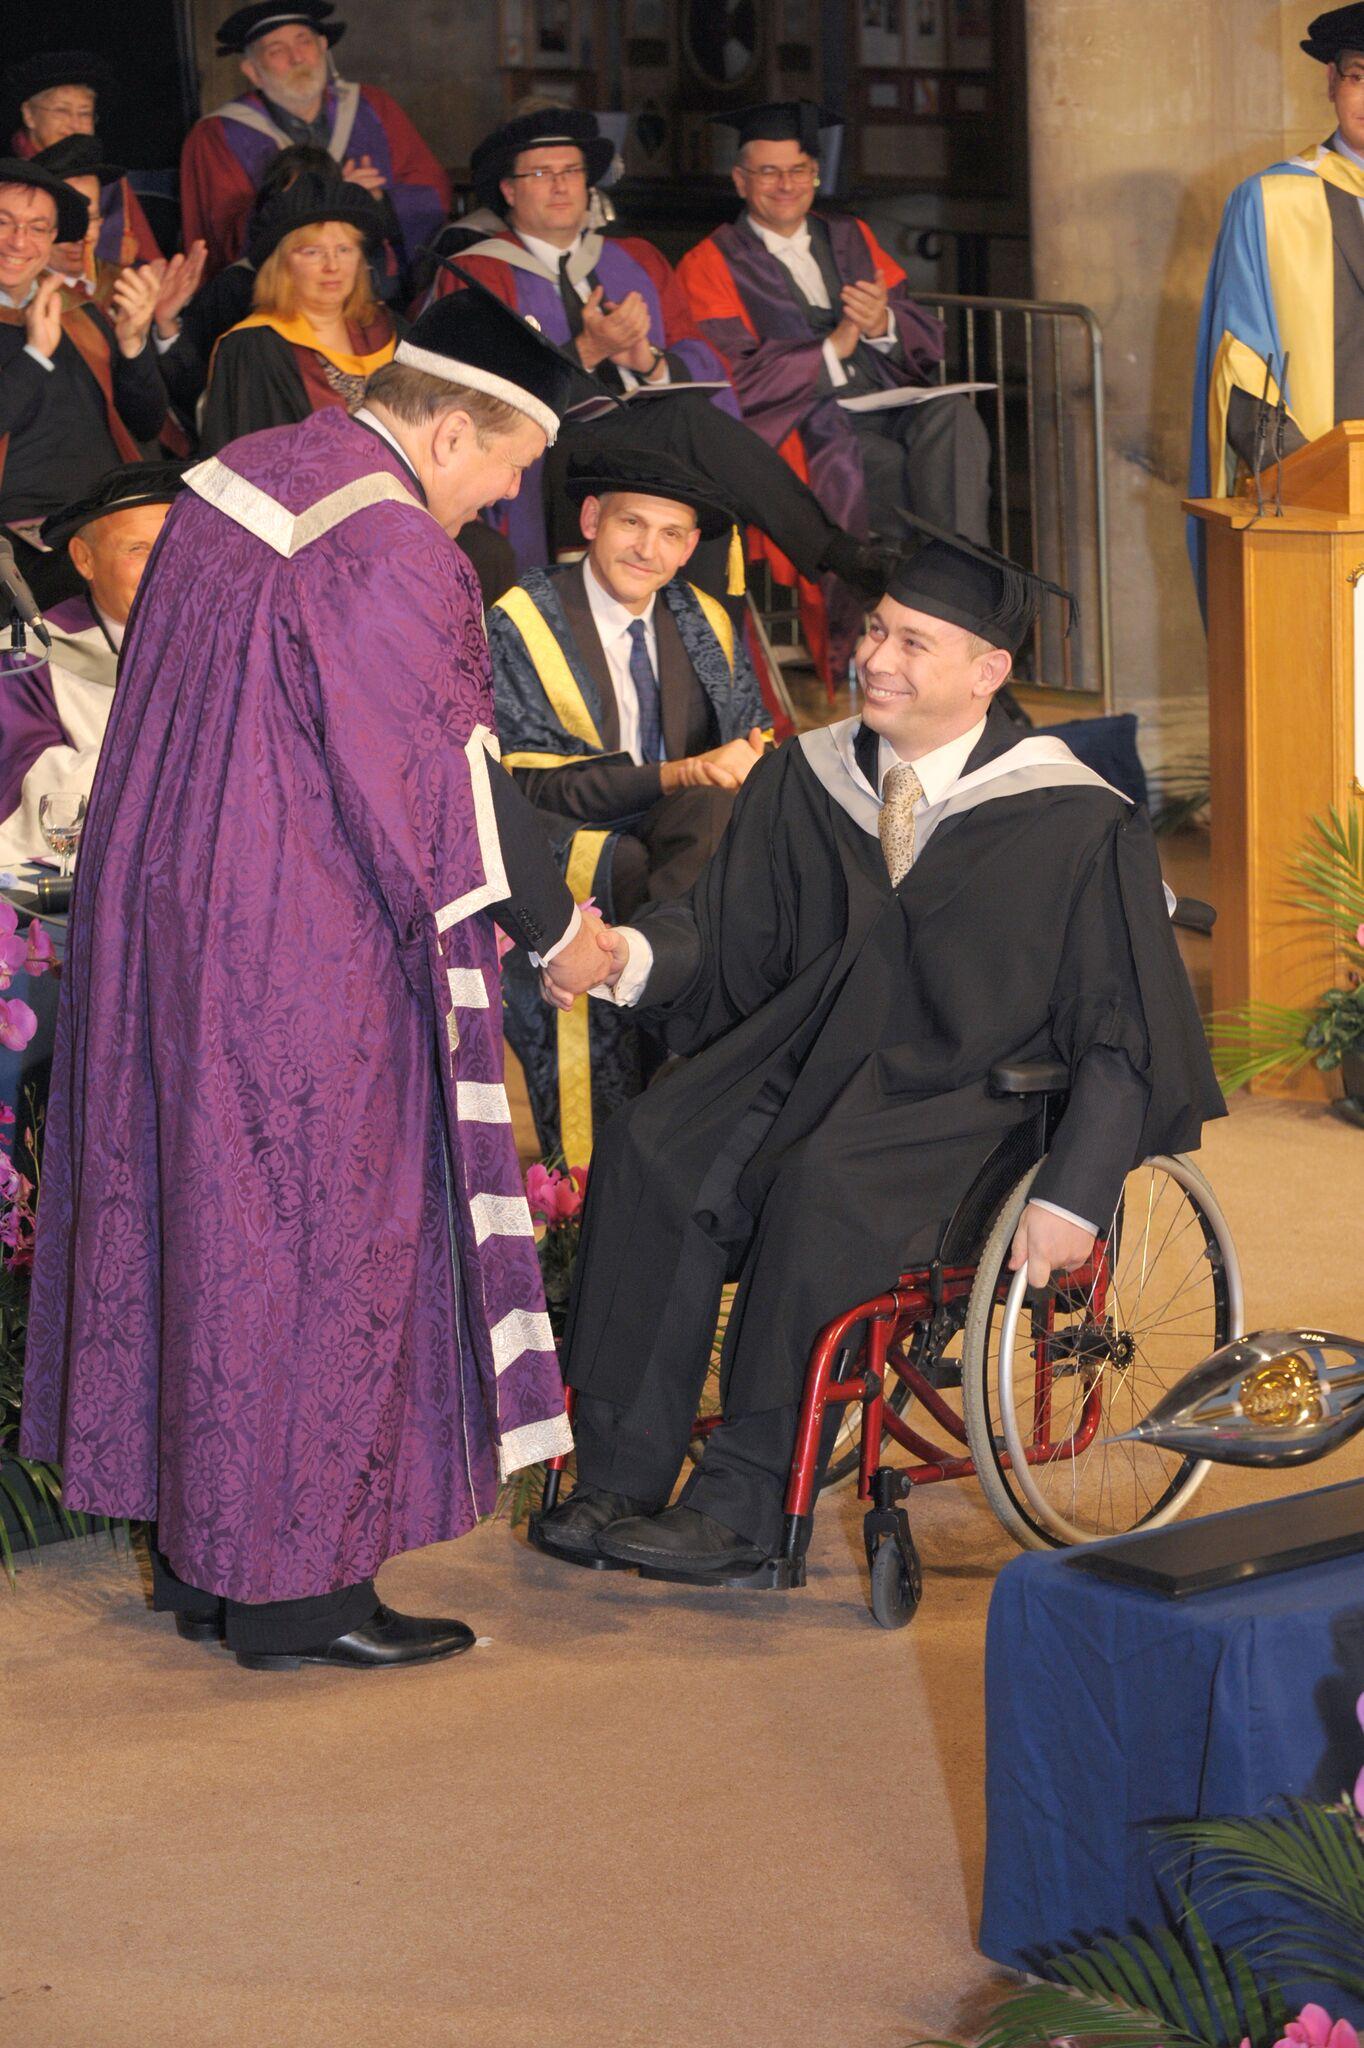 Martin graduating